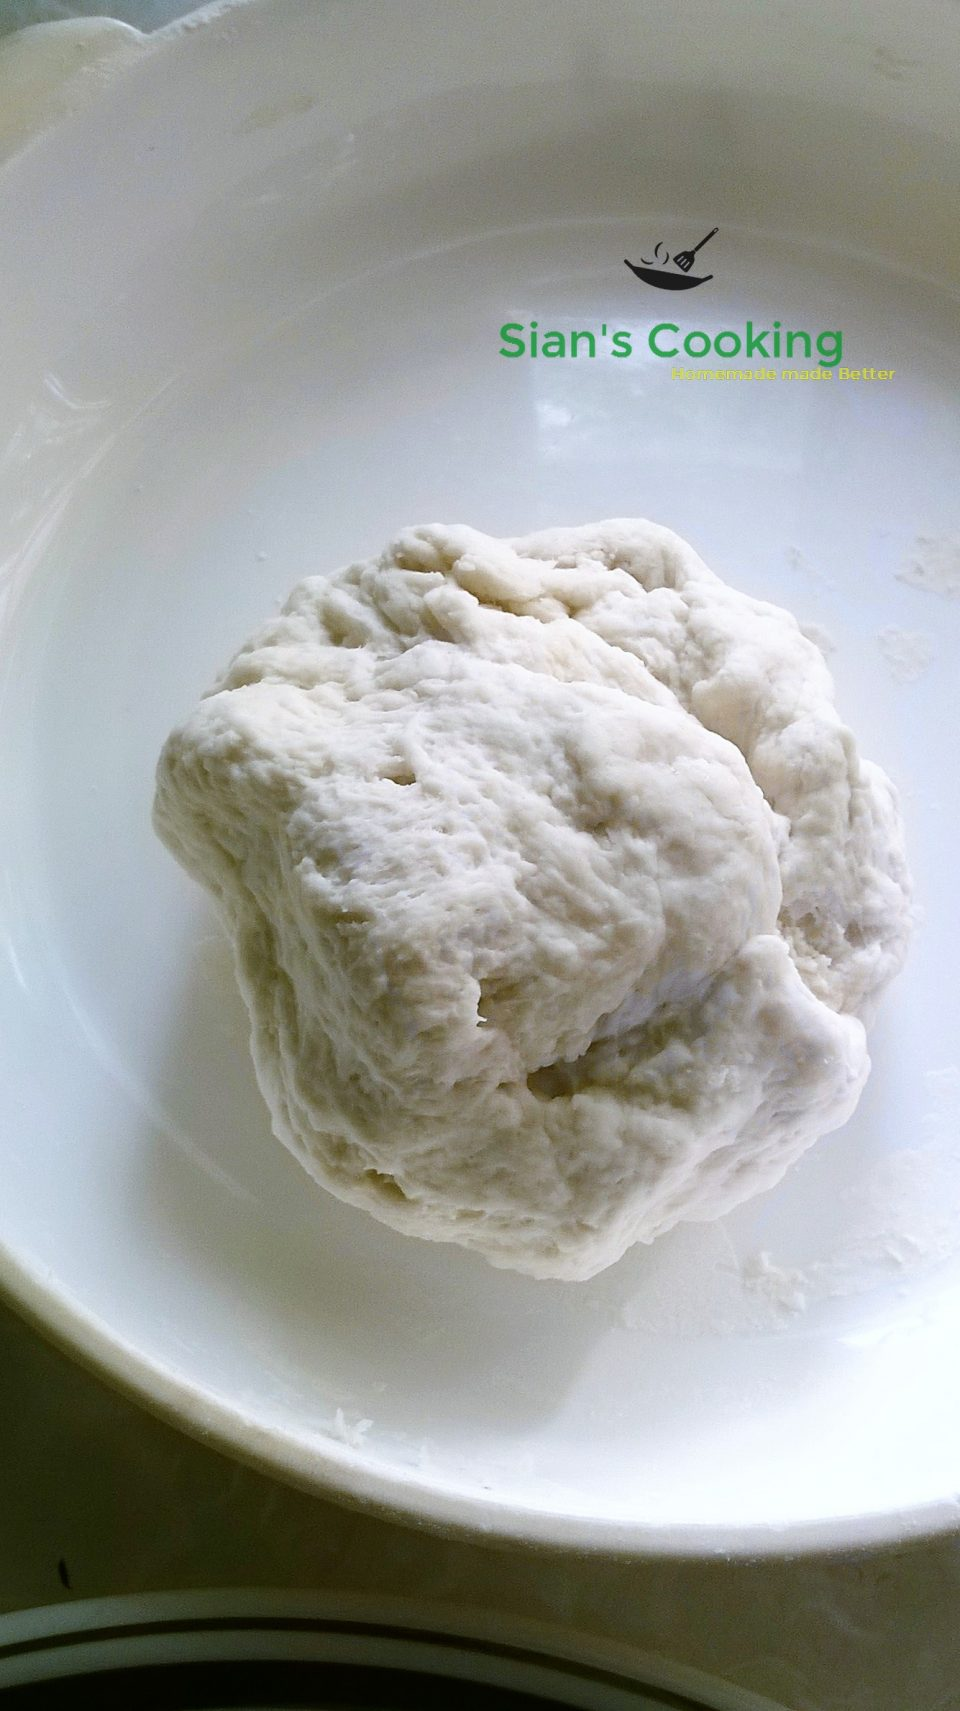 Kneaded dumpling dough